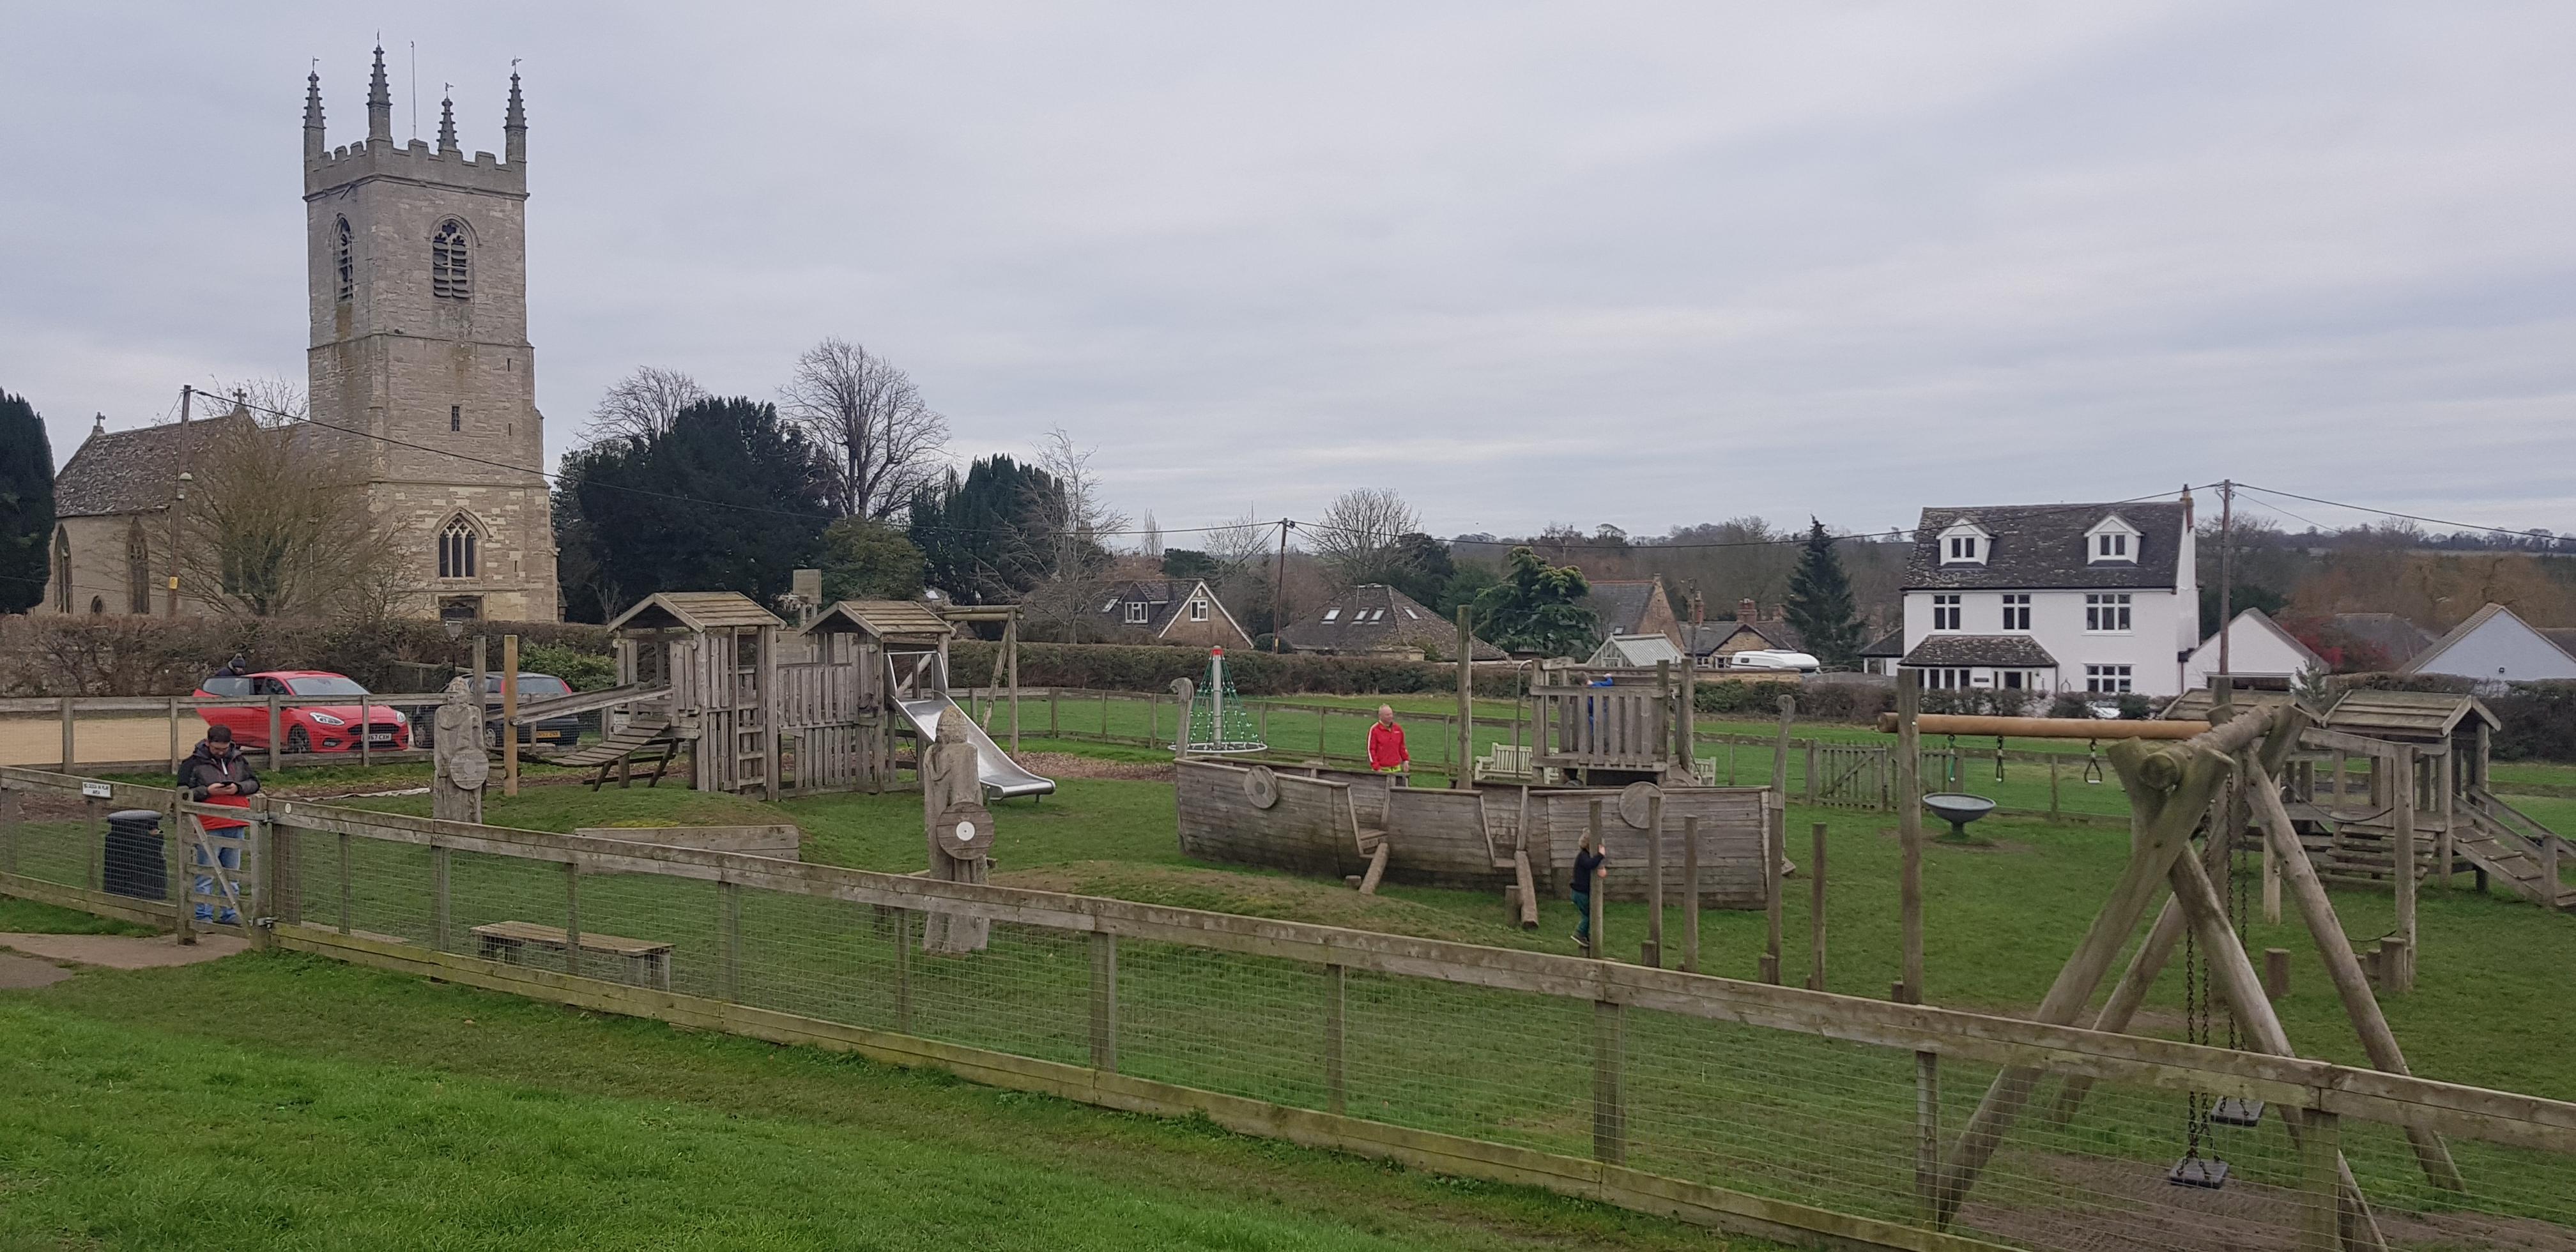 Islip play area